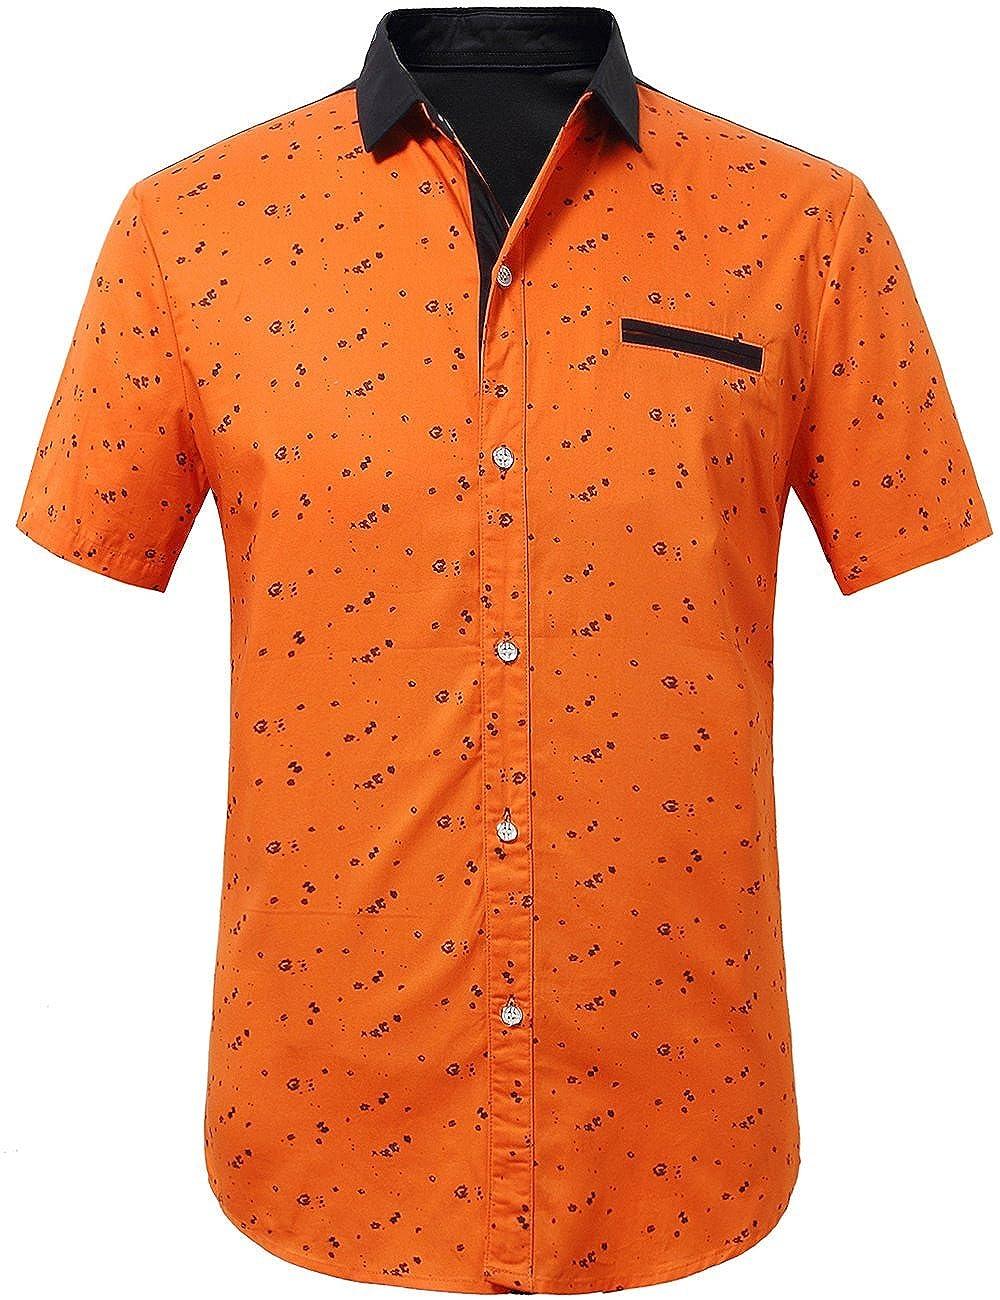 SSLR Mens Printed Button Down Casual Short Sleeve Cotton Shirts